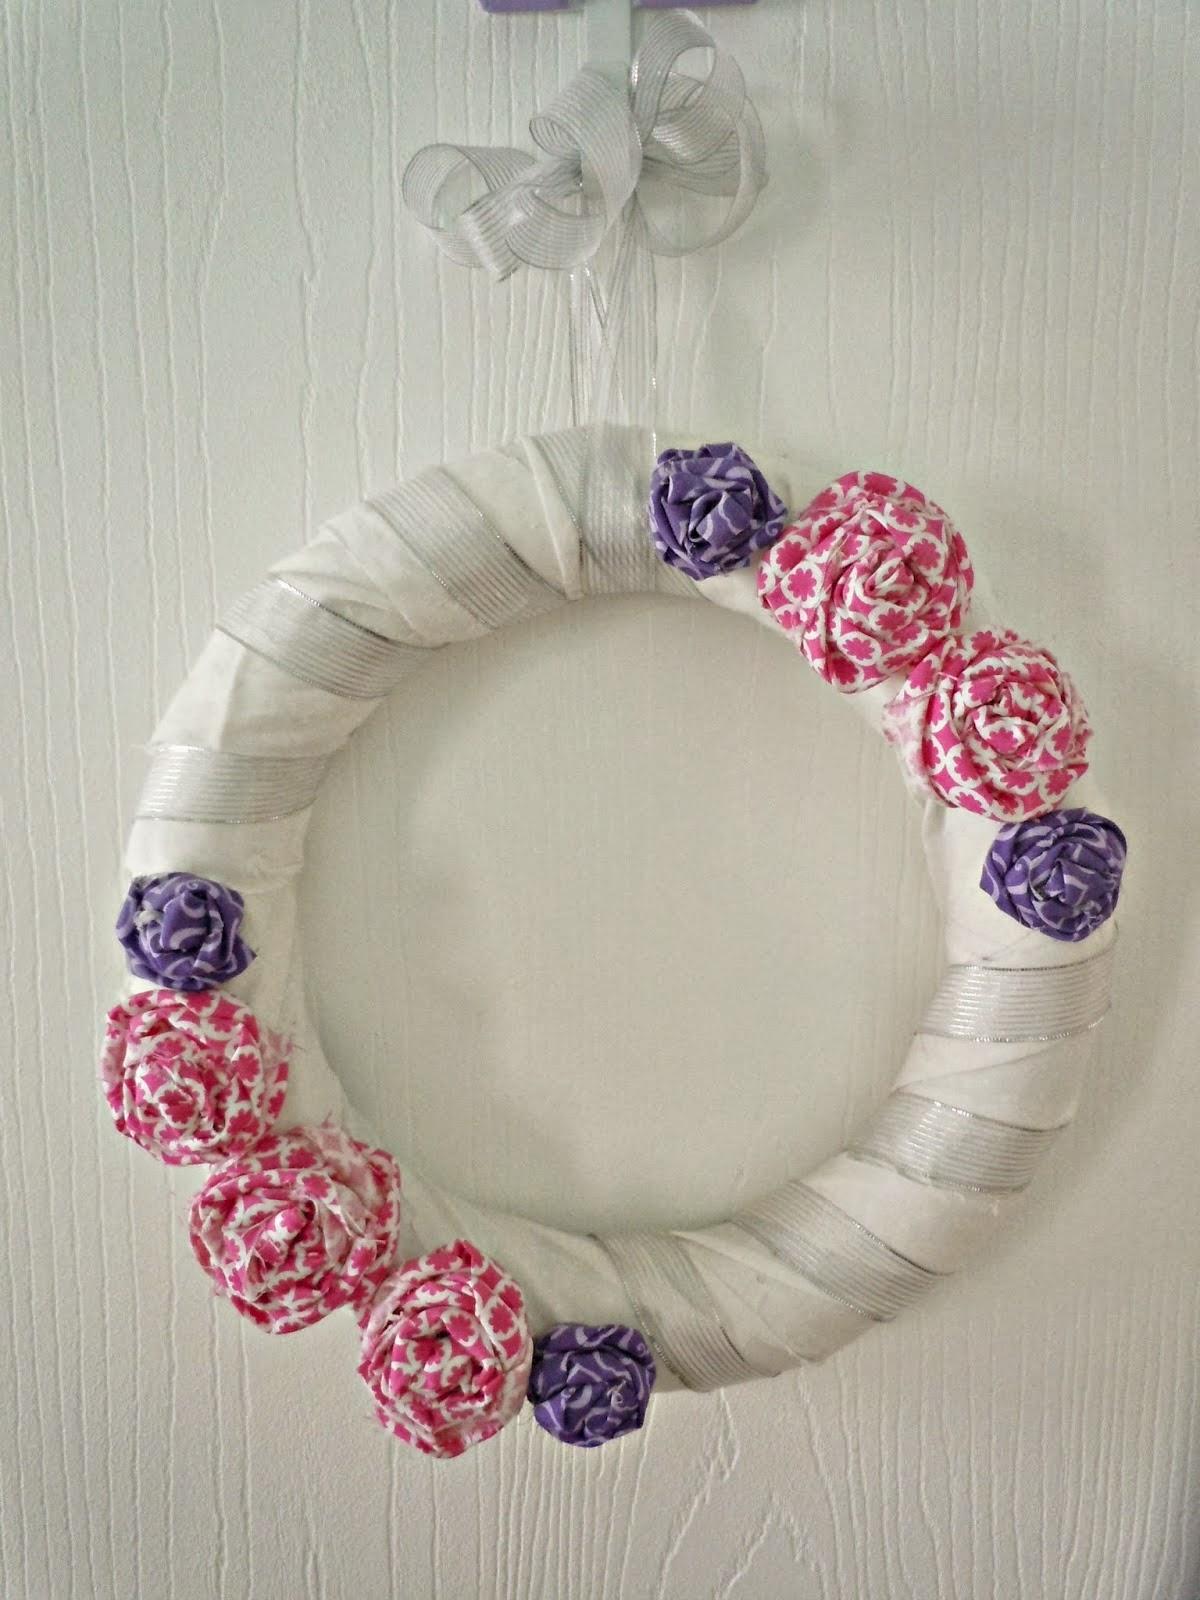 http://www.lifealittlebrighter.com/2013/02/fabric-rose-wreath.html